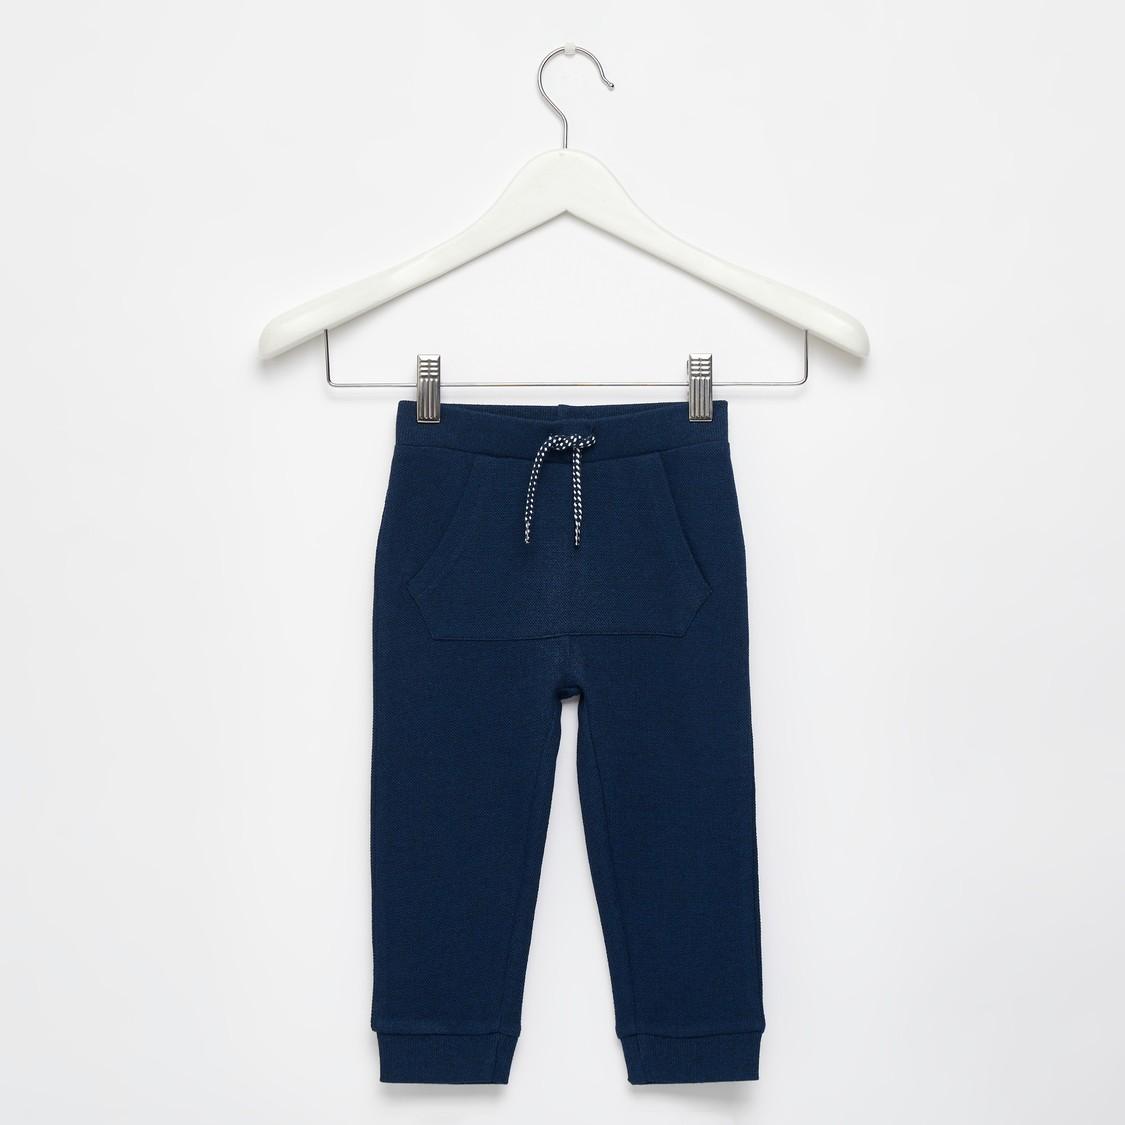 Textured Jog Pants with Pocket Detail and Drawstring Closure